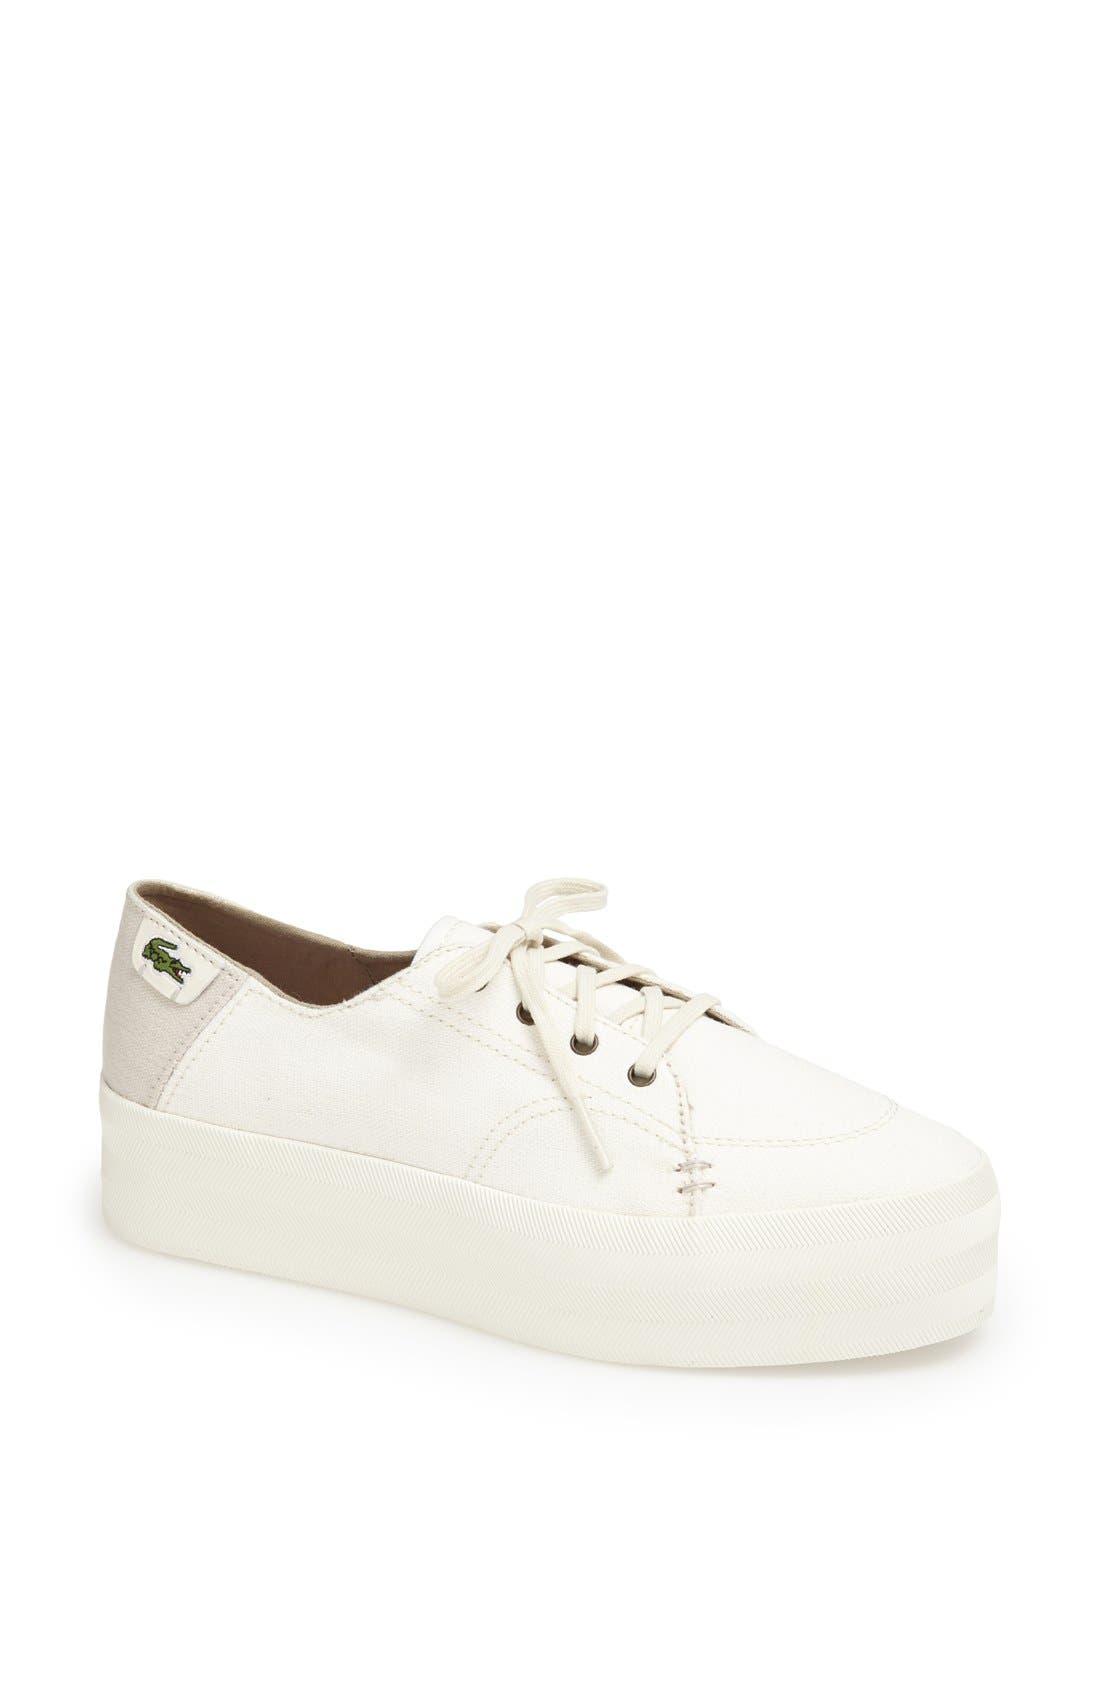 Main Image - Lacoste 'Kirton' Platform Sneaker (Women) (Online Exclusive)